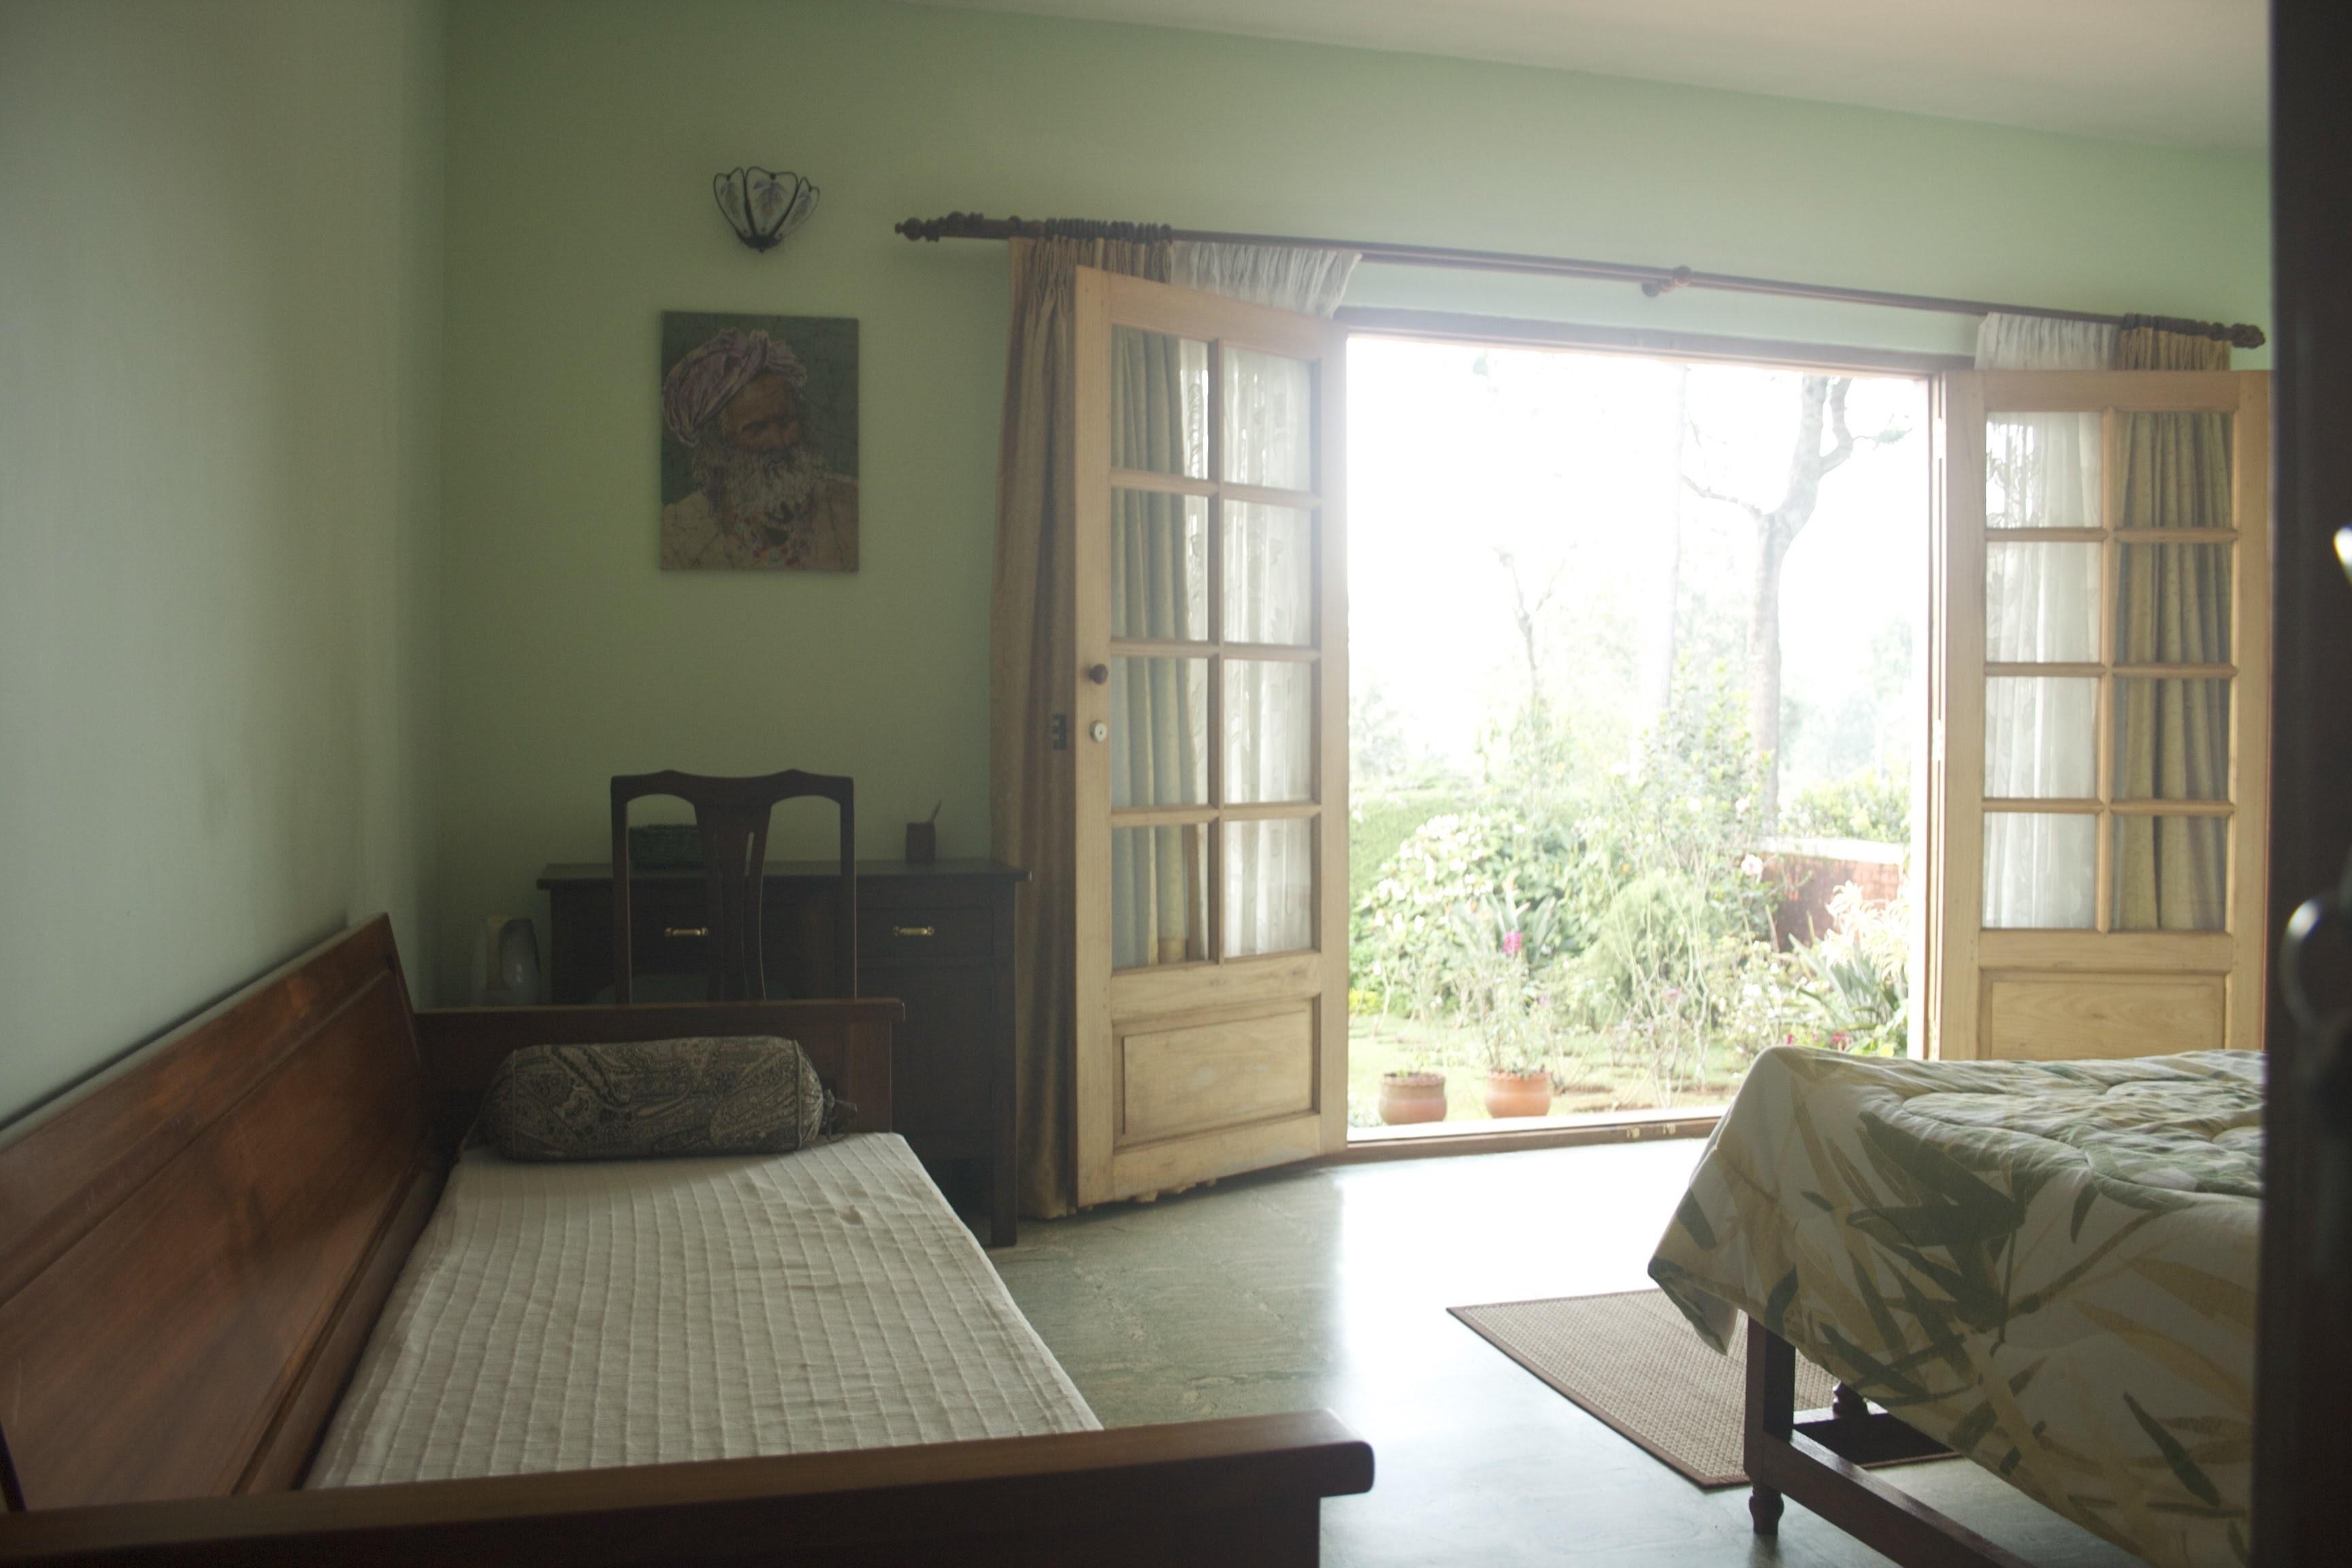 guestroom side view